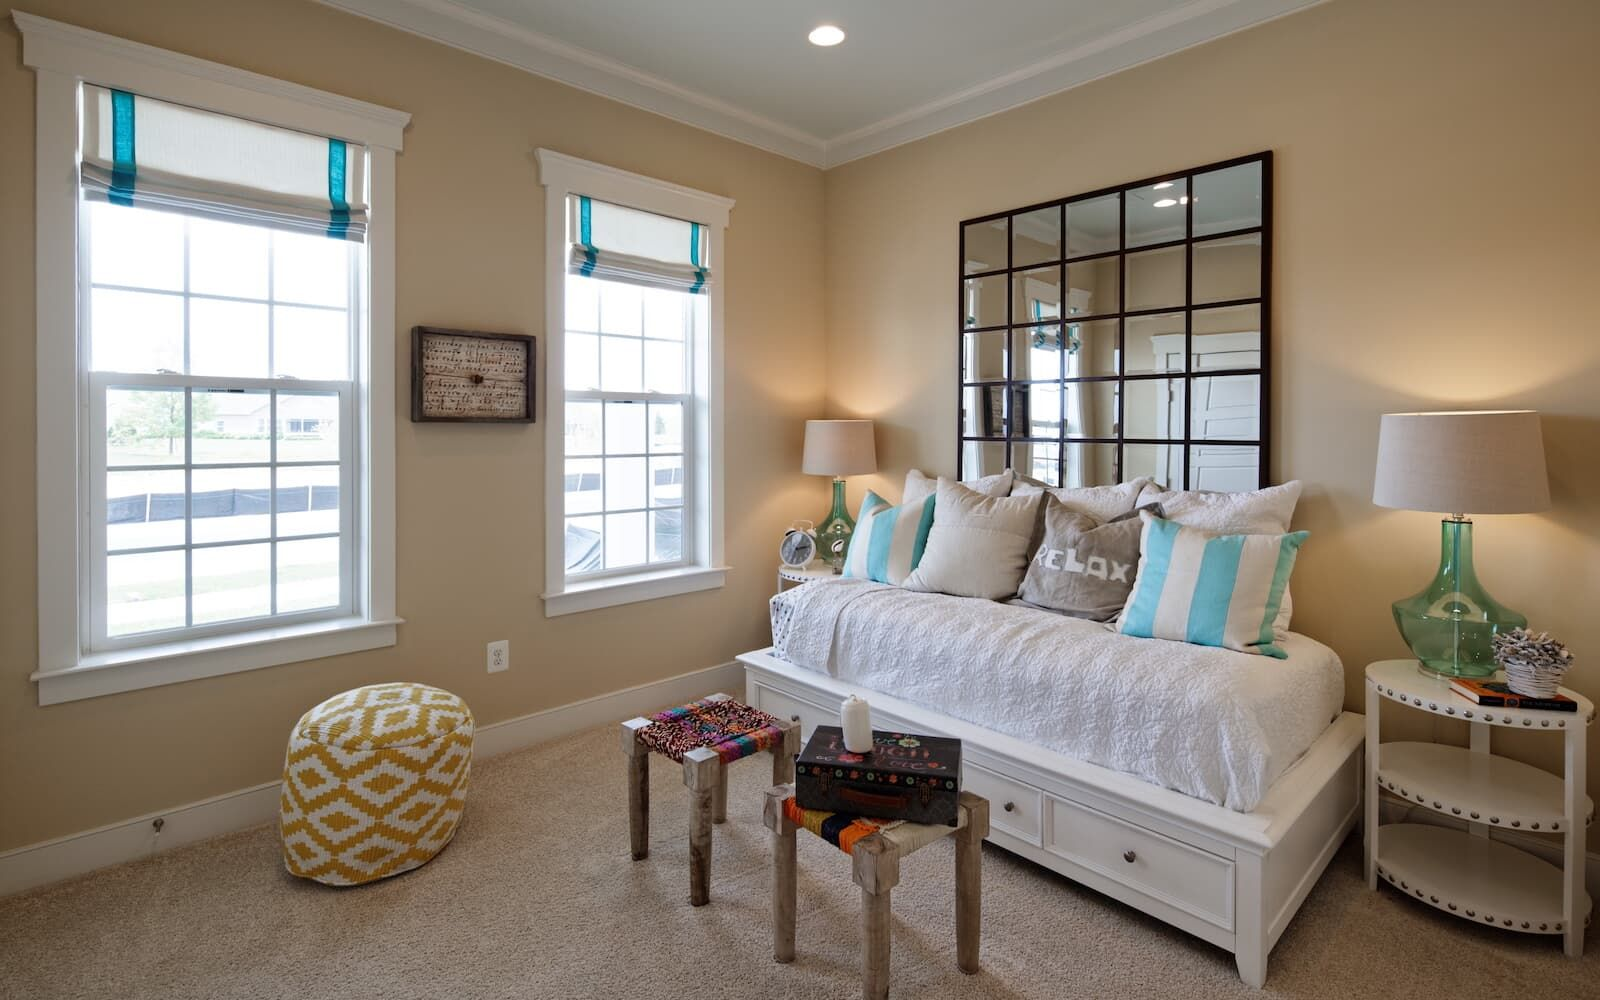 Bedroom featured in the Quincy II By Brookfield Residential in Sussex, DE